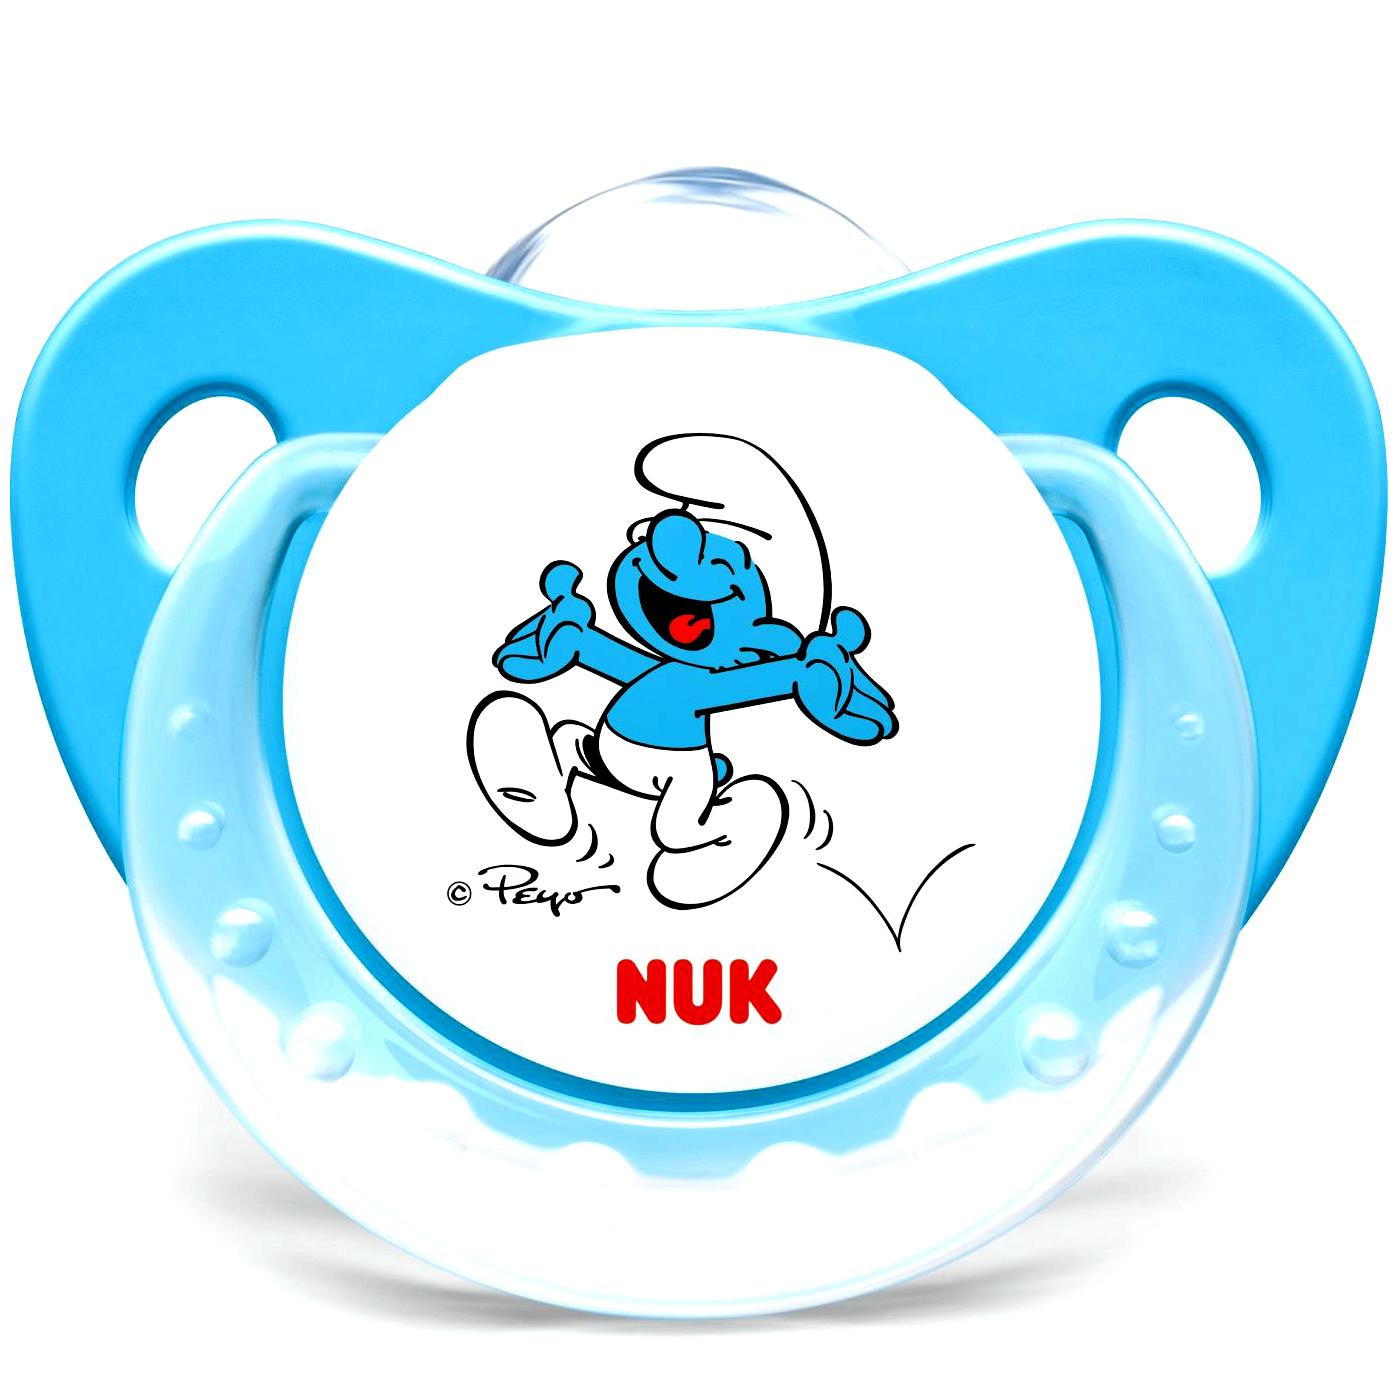 Nuk Trendline The SmurfsΠιπίλα Σιλικόνης με Κρίκο Χωρίς BPA σε Μπλε Χρώμα – Μέγεθος 2 (6-18 μηνών)